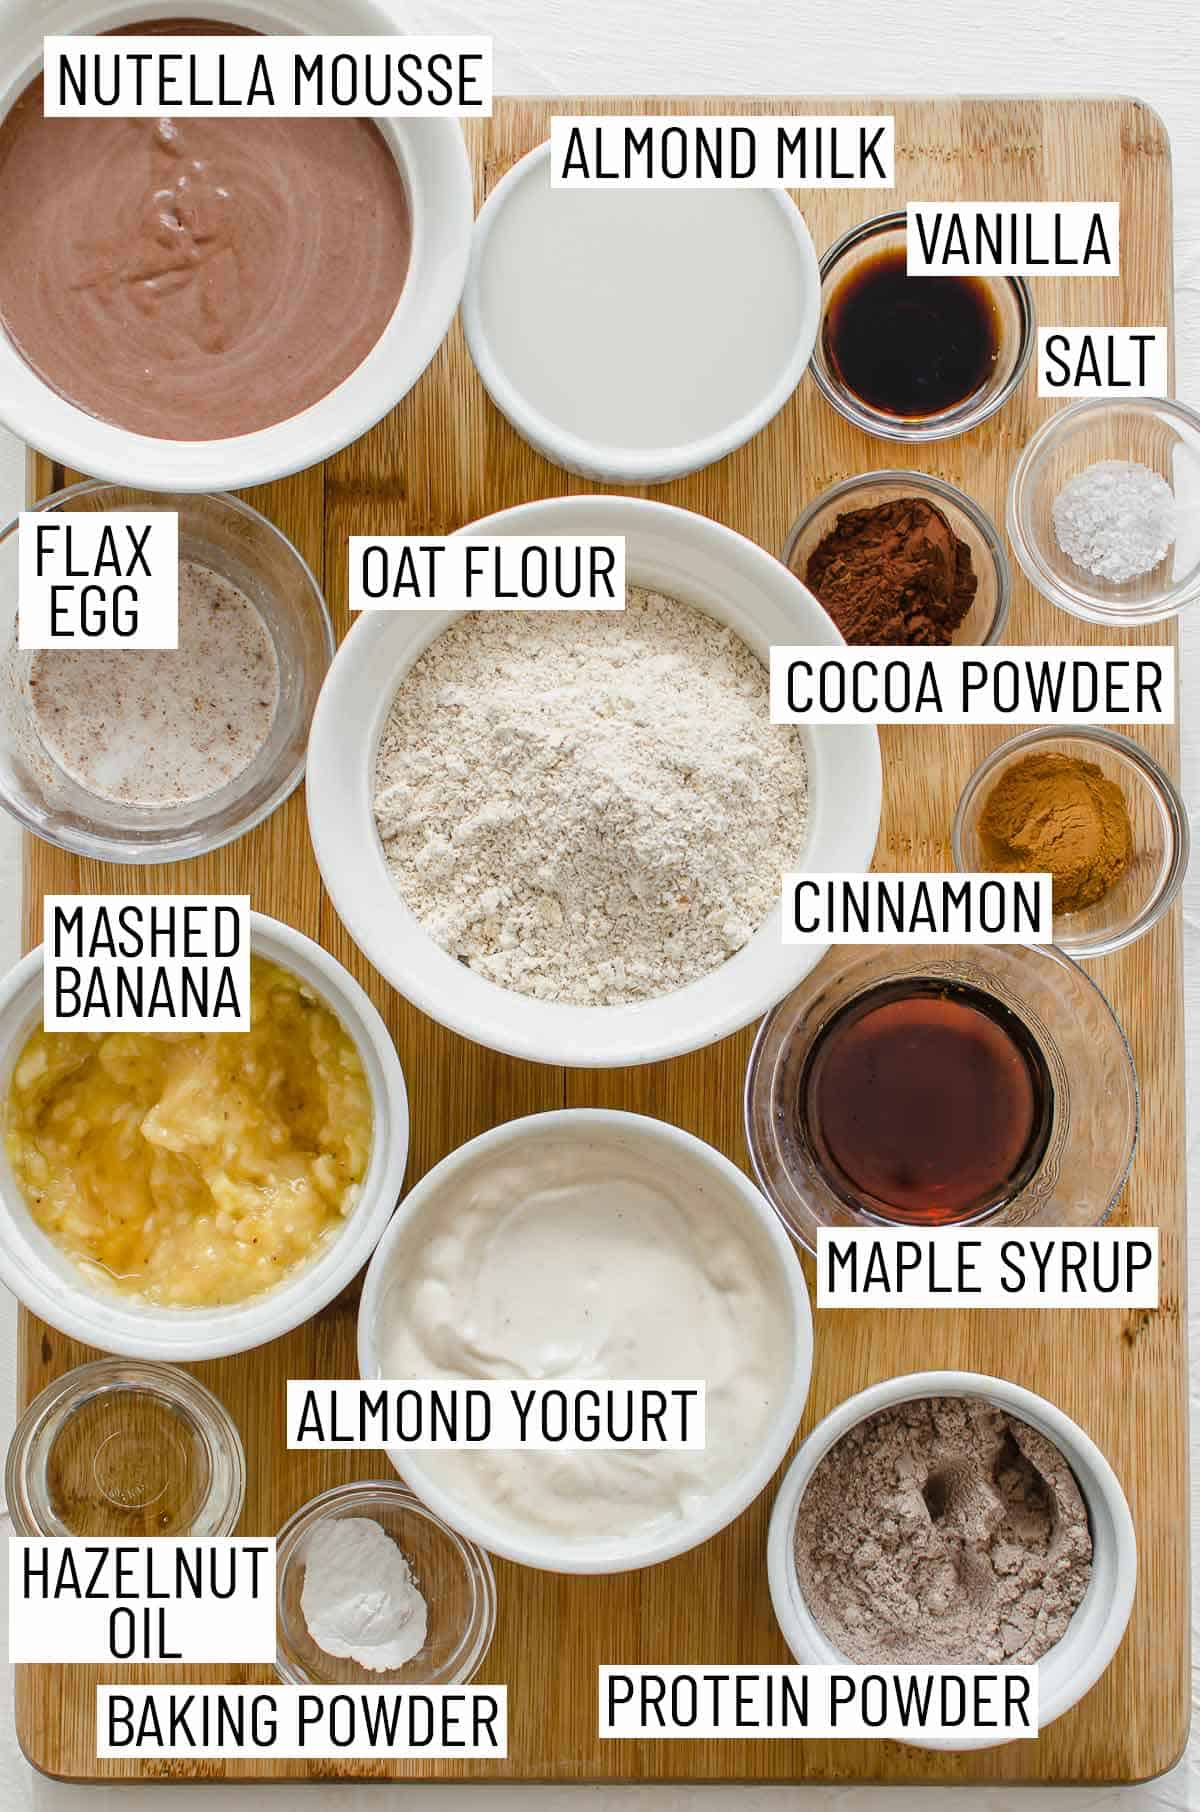 Overhead image of ingredients needed to make pancakes: mousse, almond milk, vanilla, salt, cocoa powder, cinnamon, oat flour, flax egg, mashed banana, maple syrup, almond yogurt, hazelnut oil, baking powder, and protein powder.